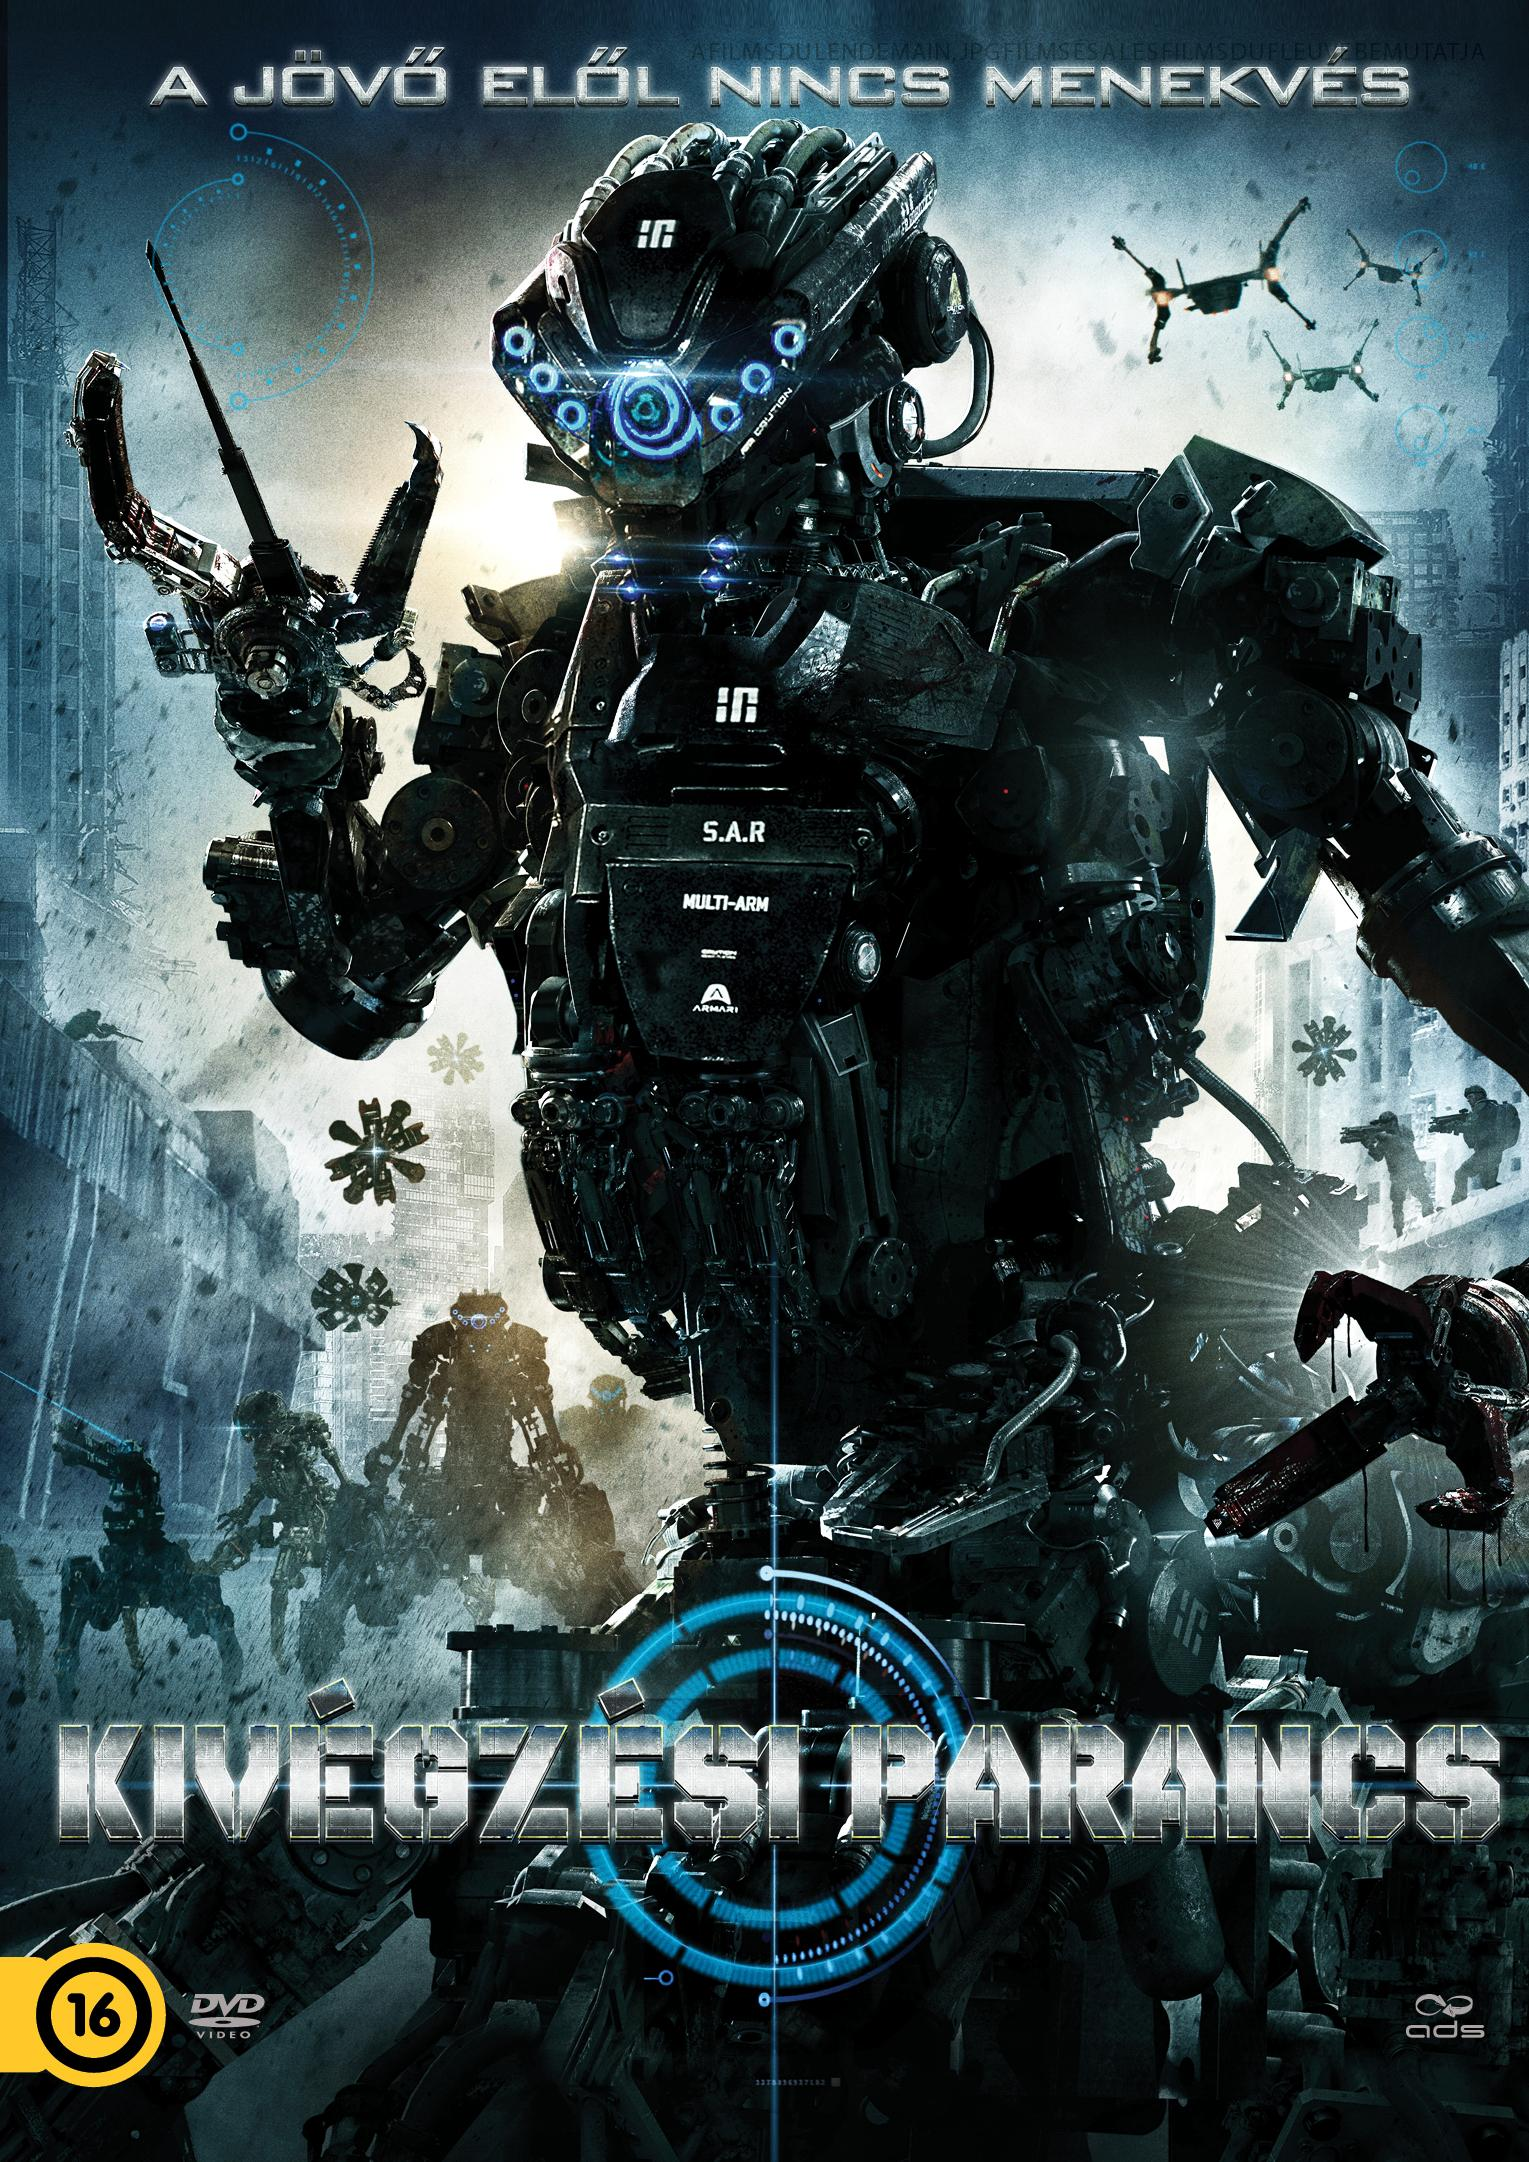 - KIVÉGZÉSI PARANCS - DVD -